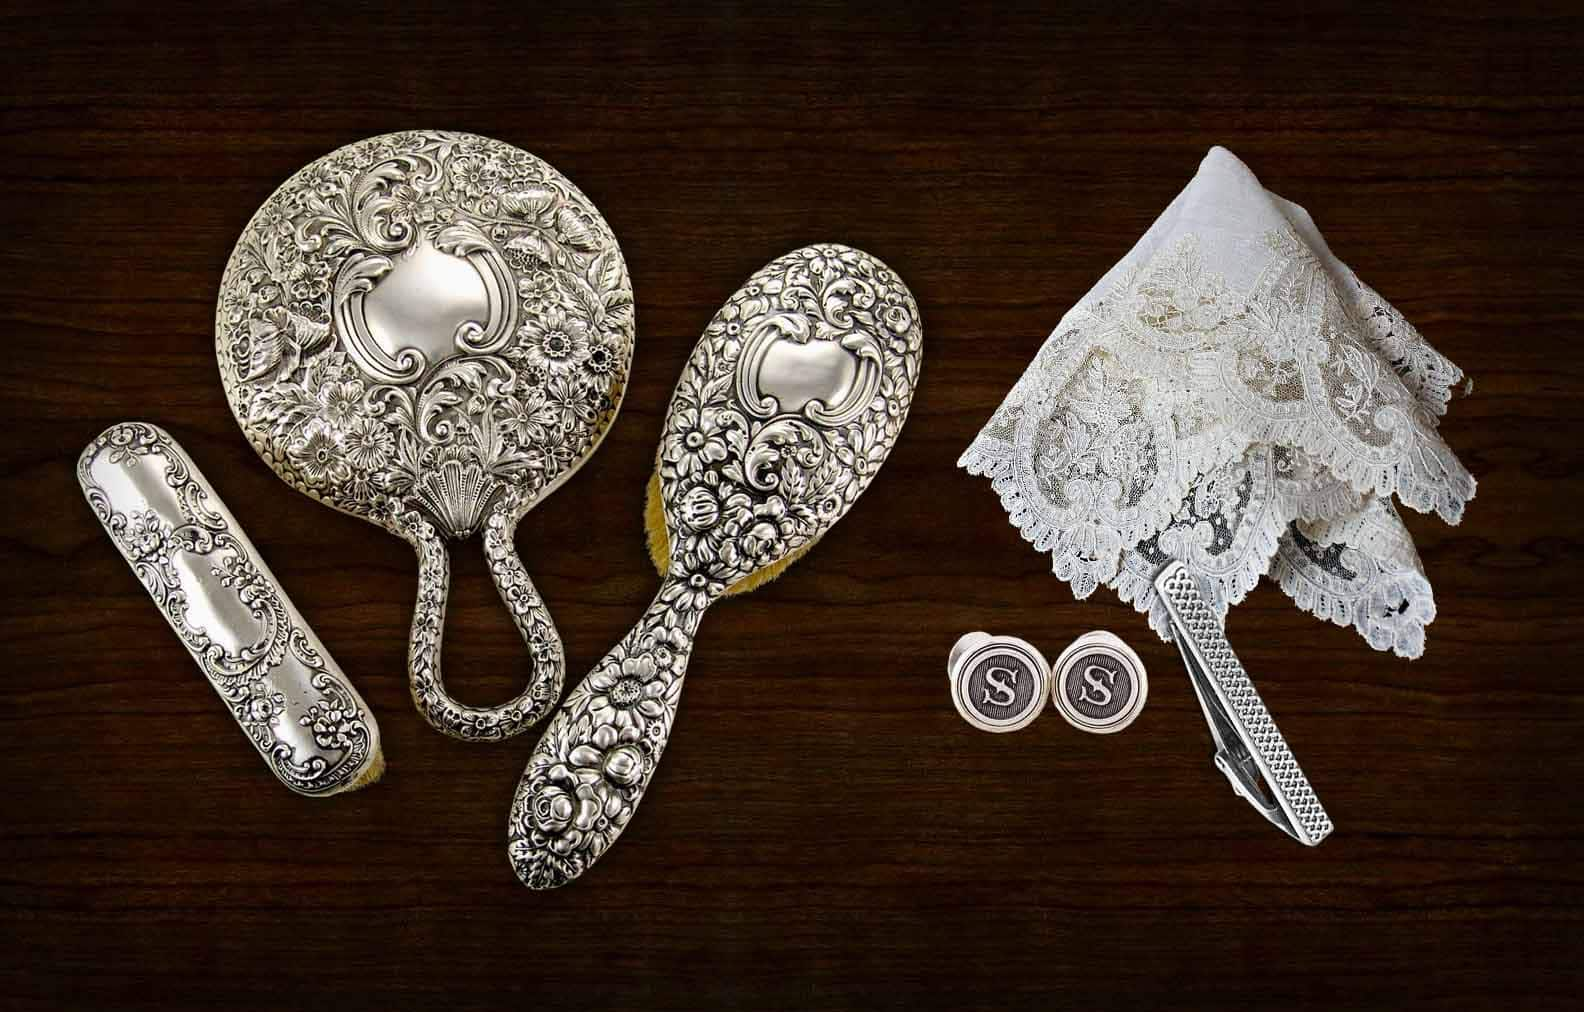 The vanity contains a hairbrush, mirror, handkerchief, cufflinks, and an unbroken tie clip.